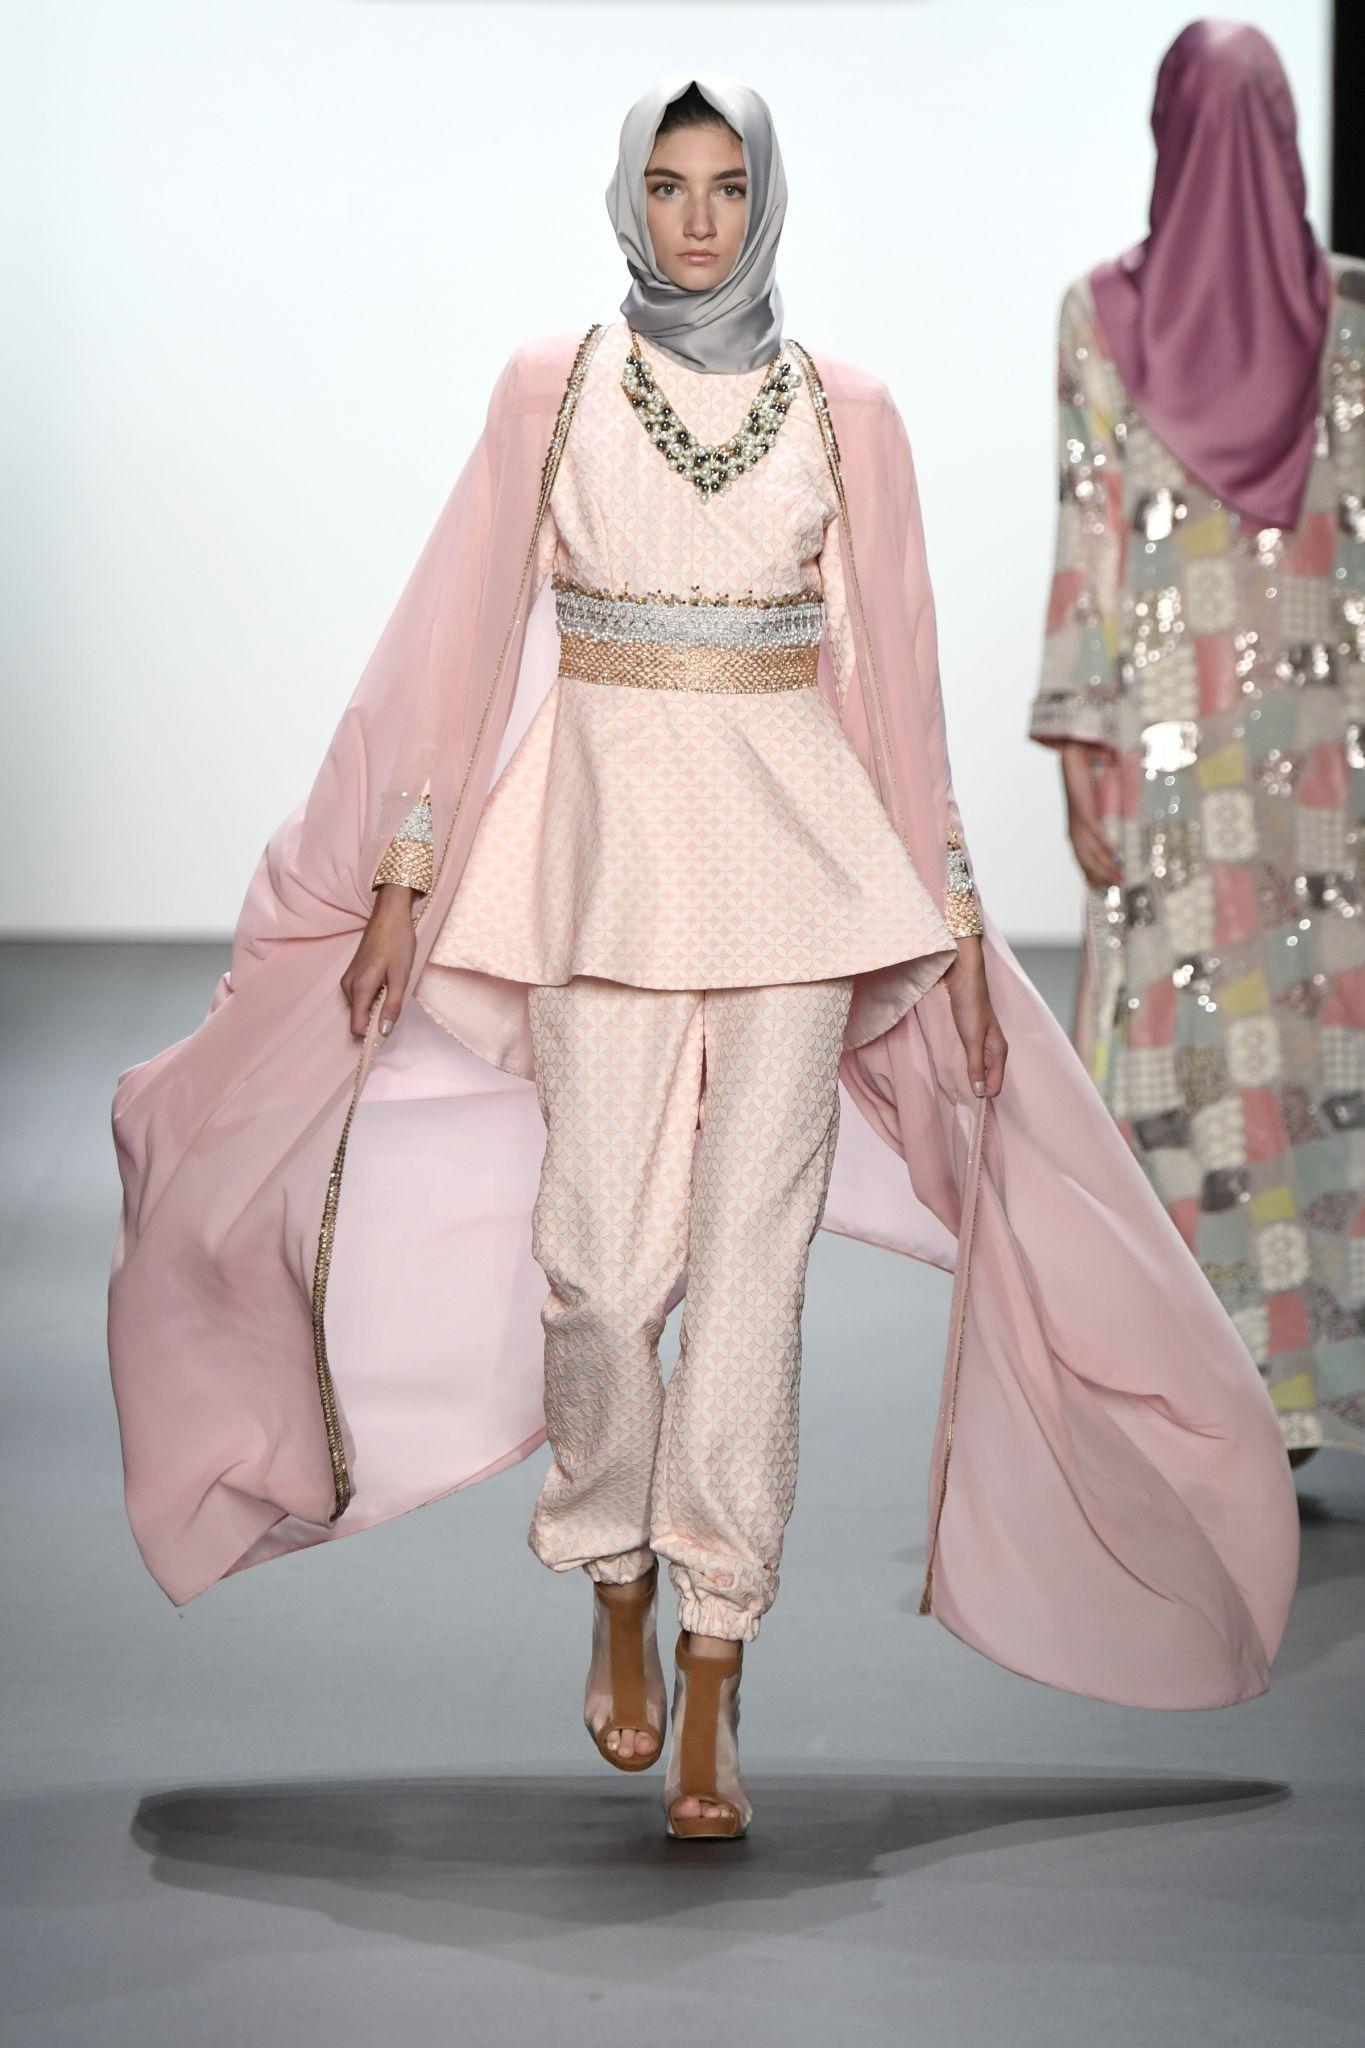 New York Designer Fashion: Muslim Designer Creates Amazing Hijab Fashion For New York